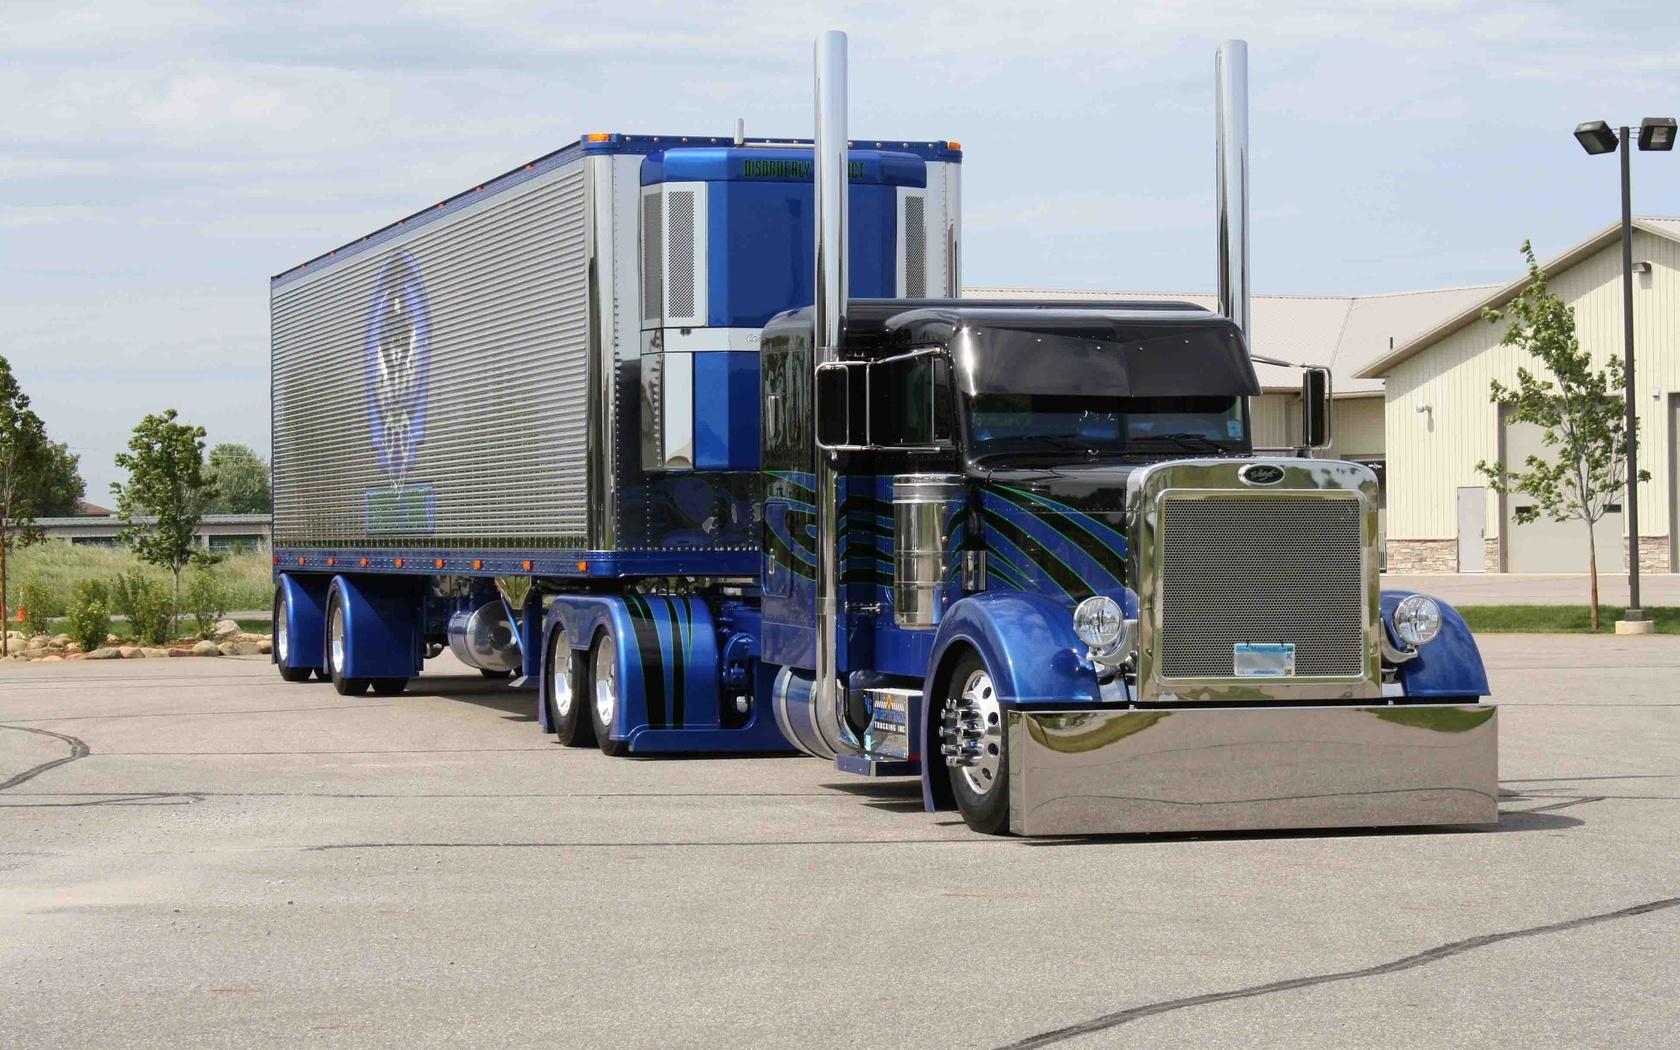 кастом грузовиков фото душе котёнок